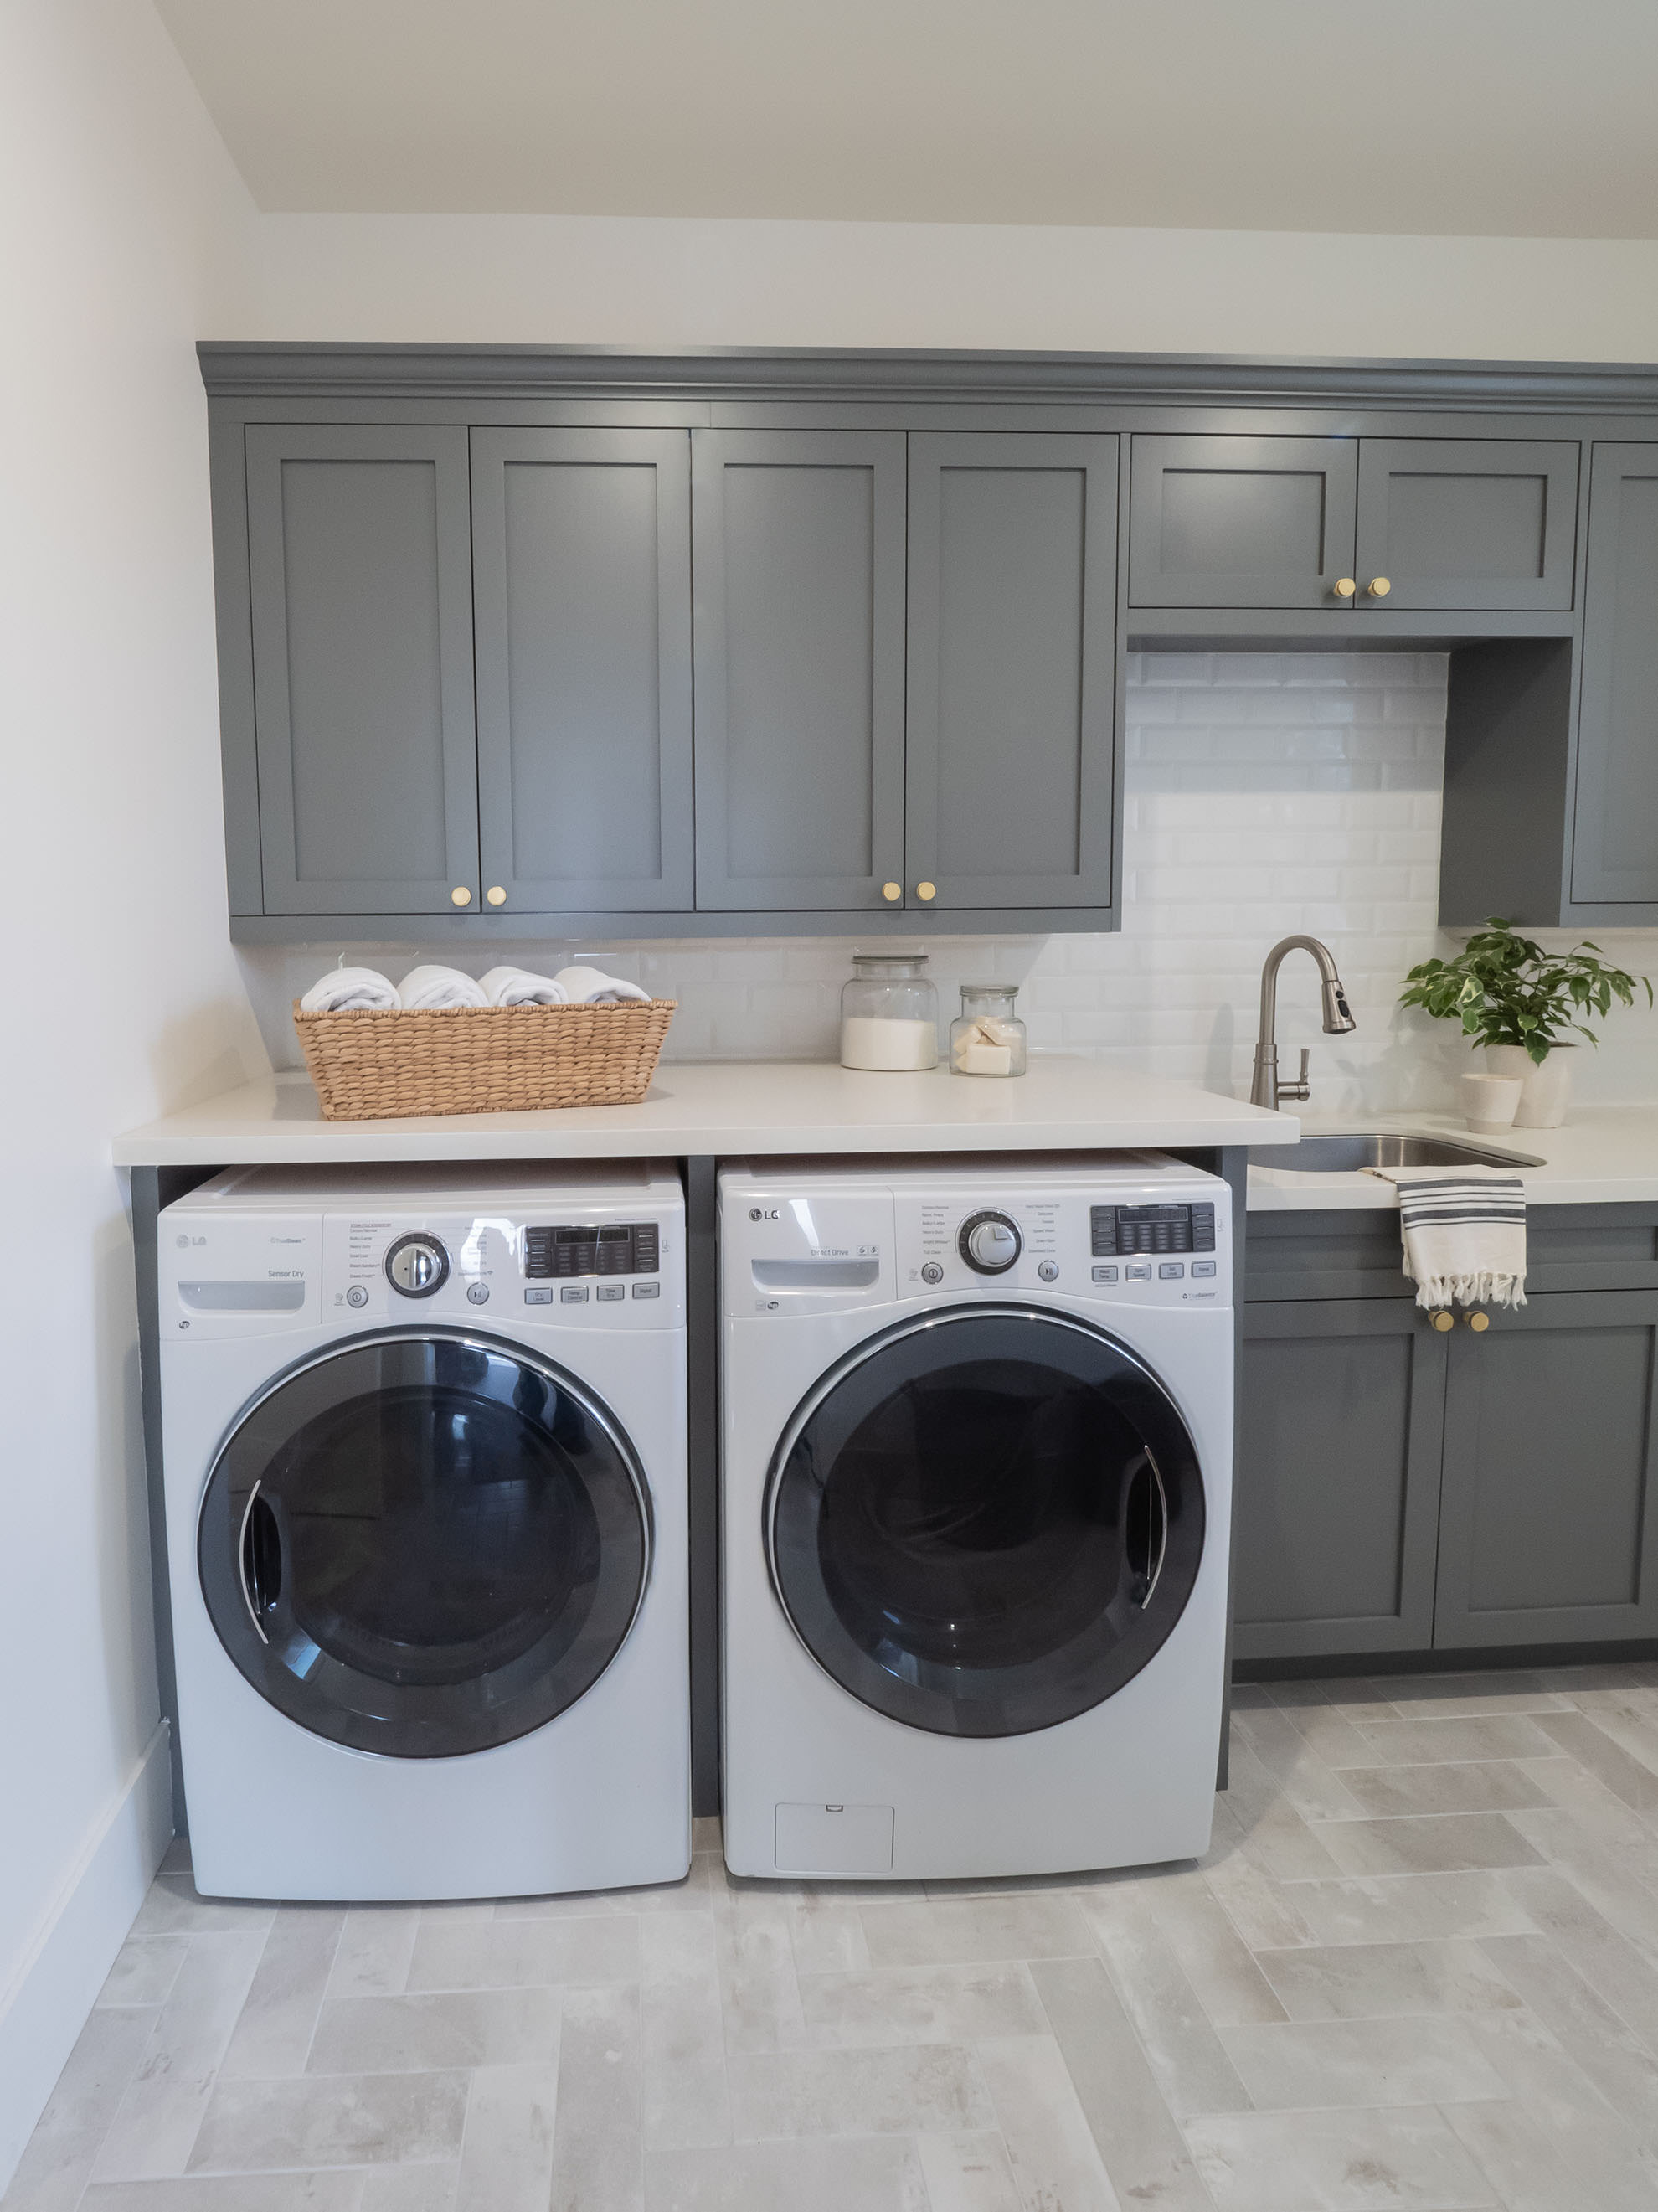 tnd-laundry-1010134.jpg